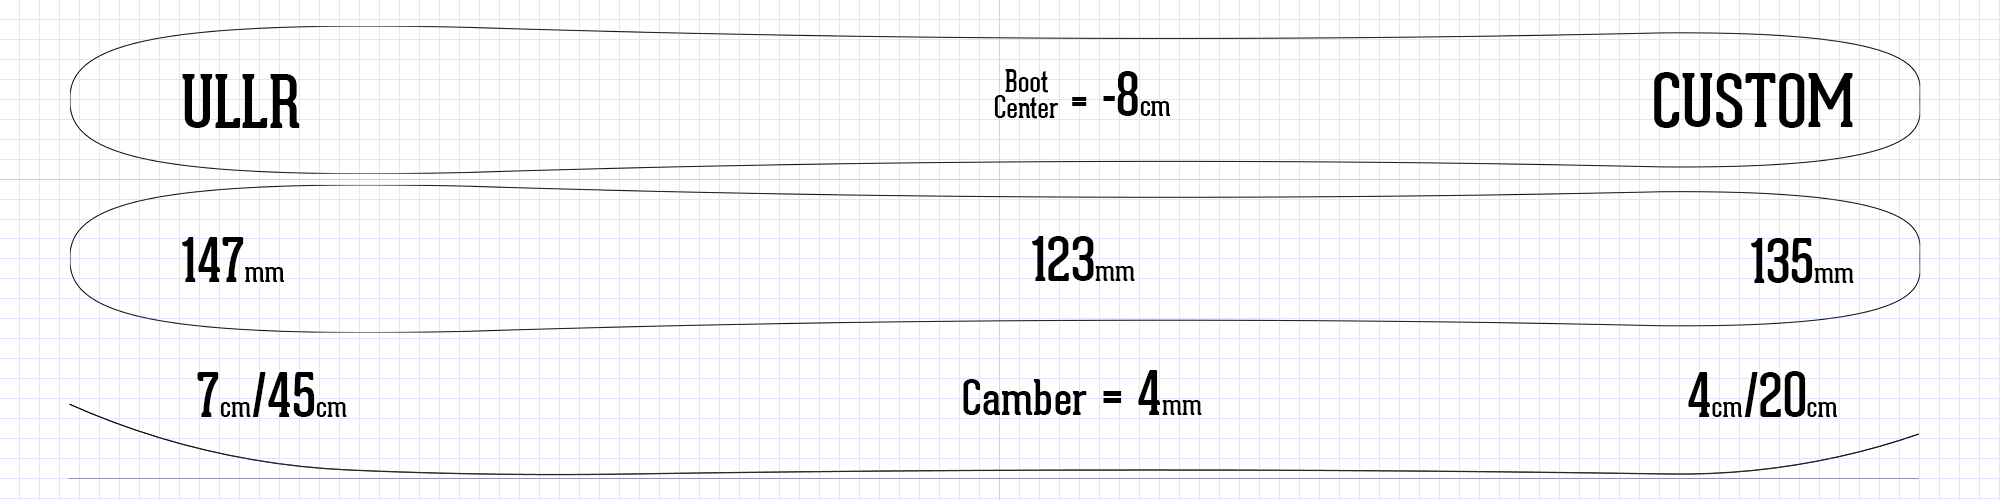 Ullr ski information rocker camber profile specs